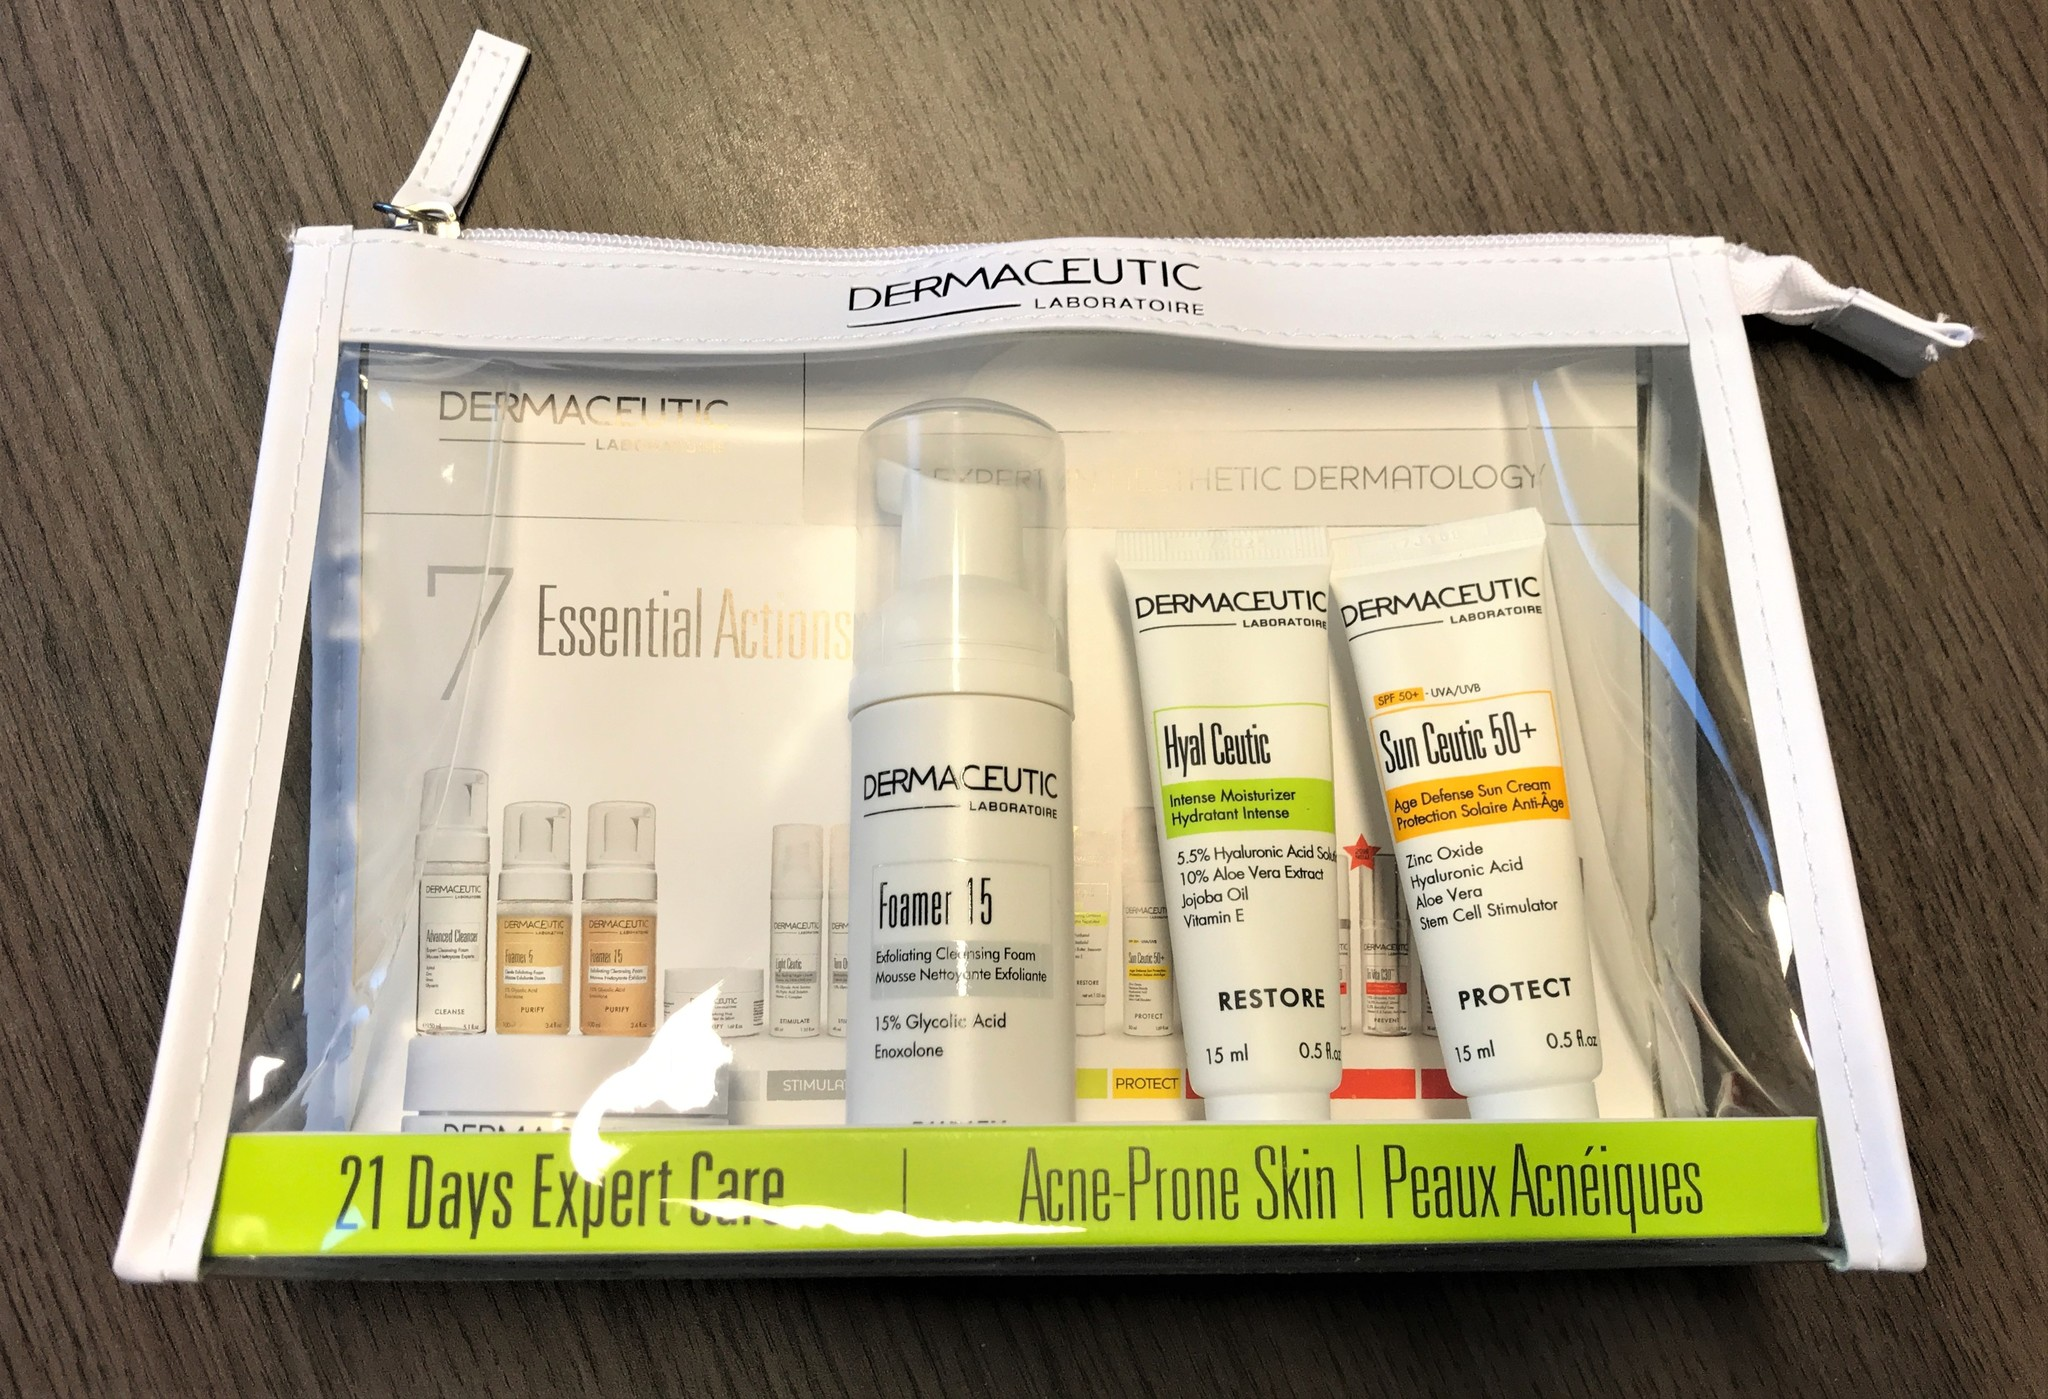 21 days expert care kit-Acné prone Skin